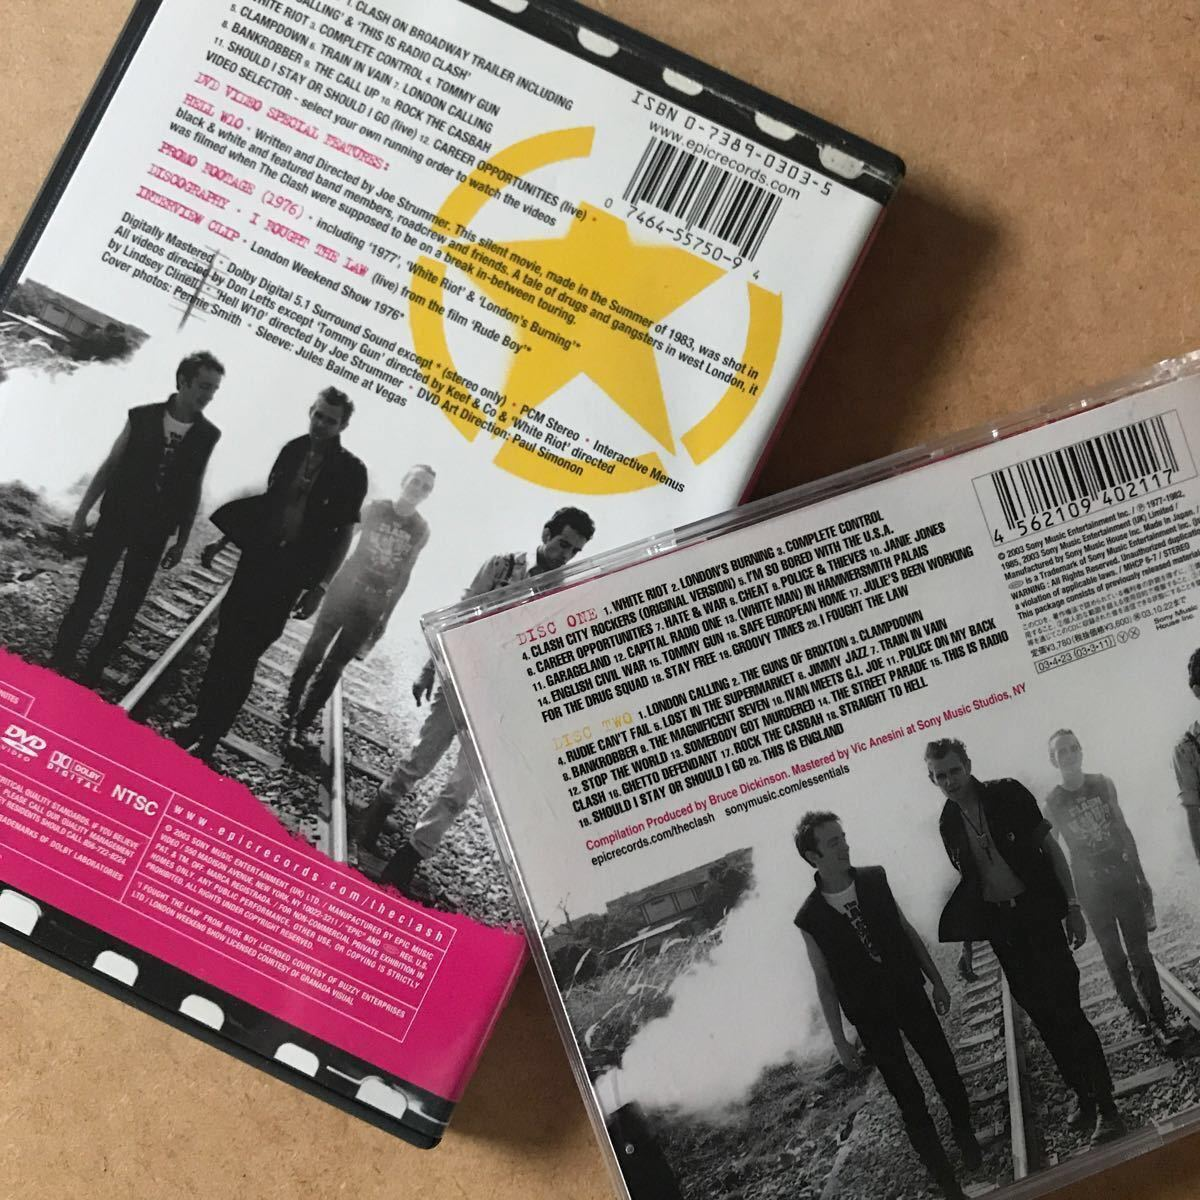 ◆THE Essential Clash ザクラッシュ /1DVD 輸入盤+ 2CD 国内盤 2組セット